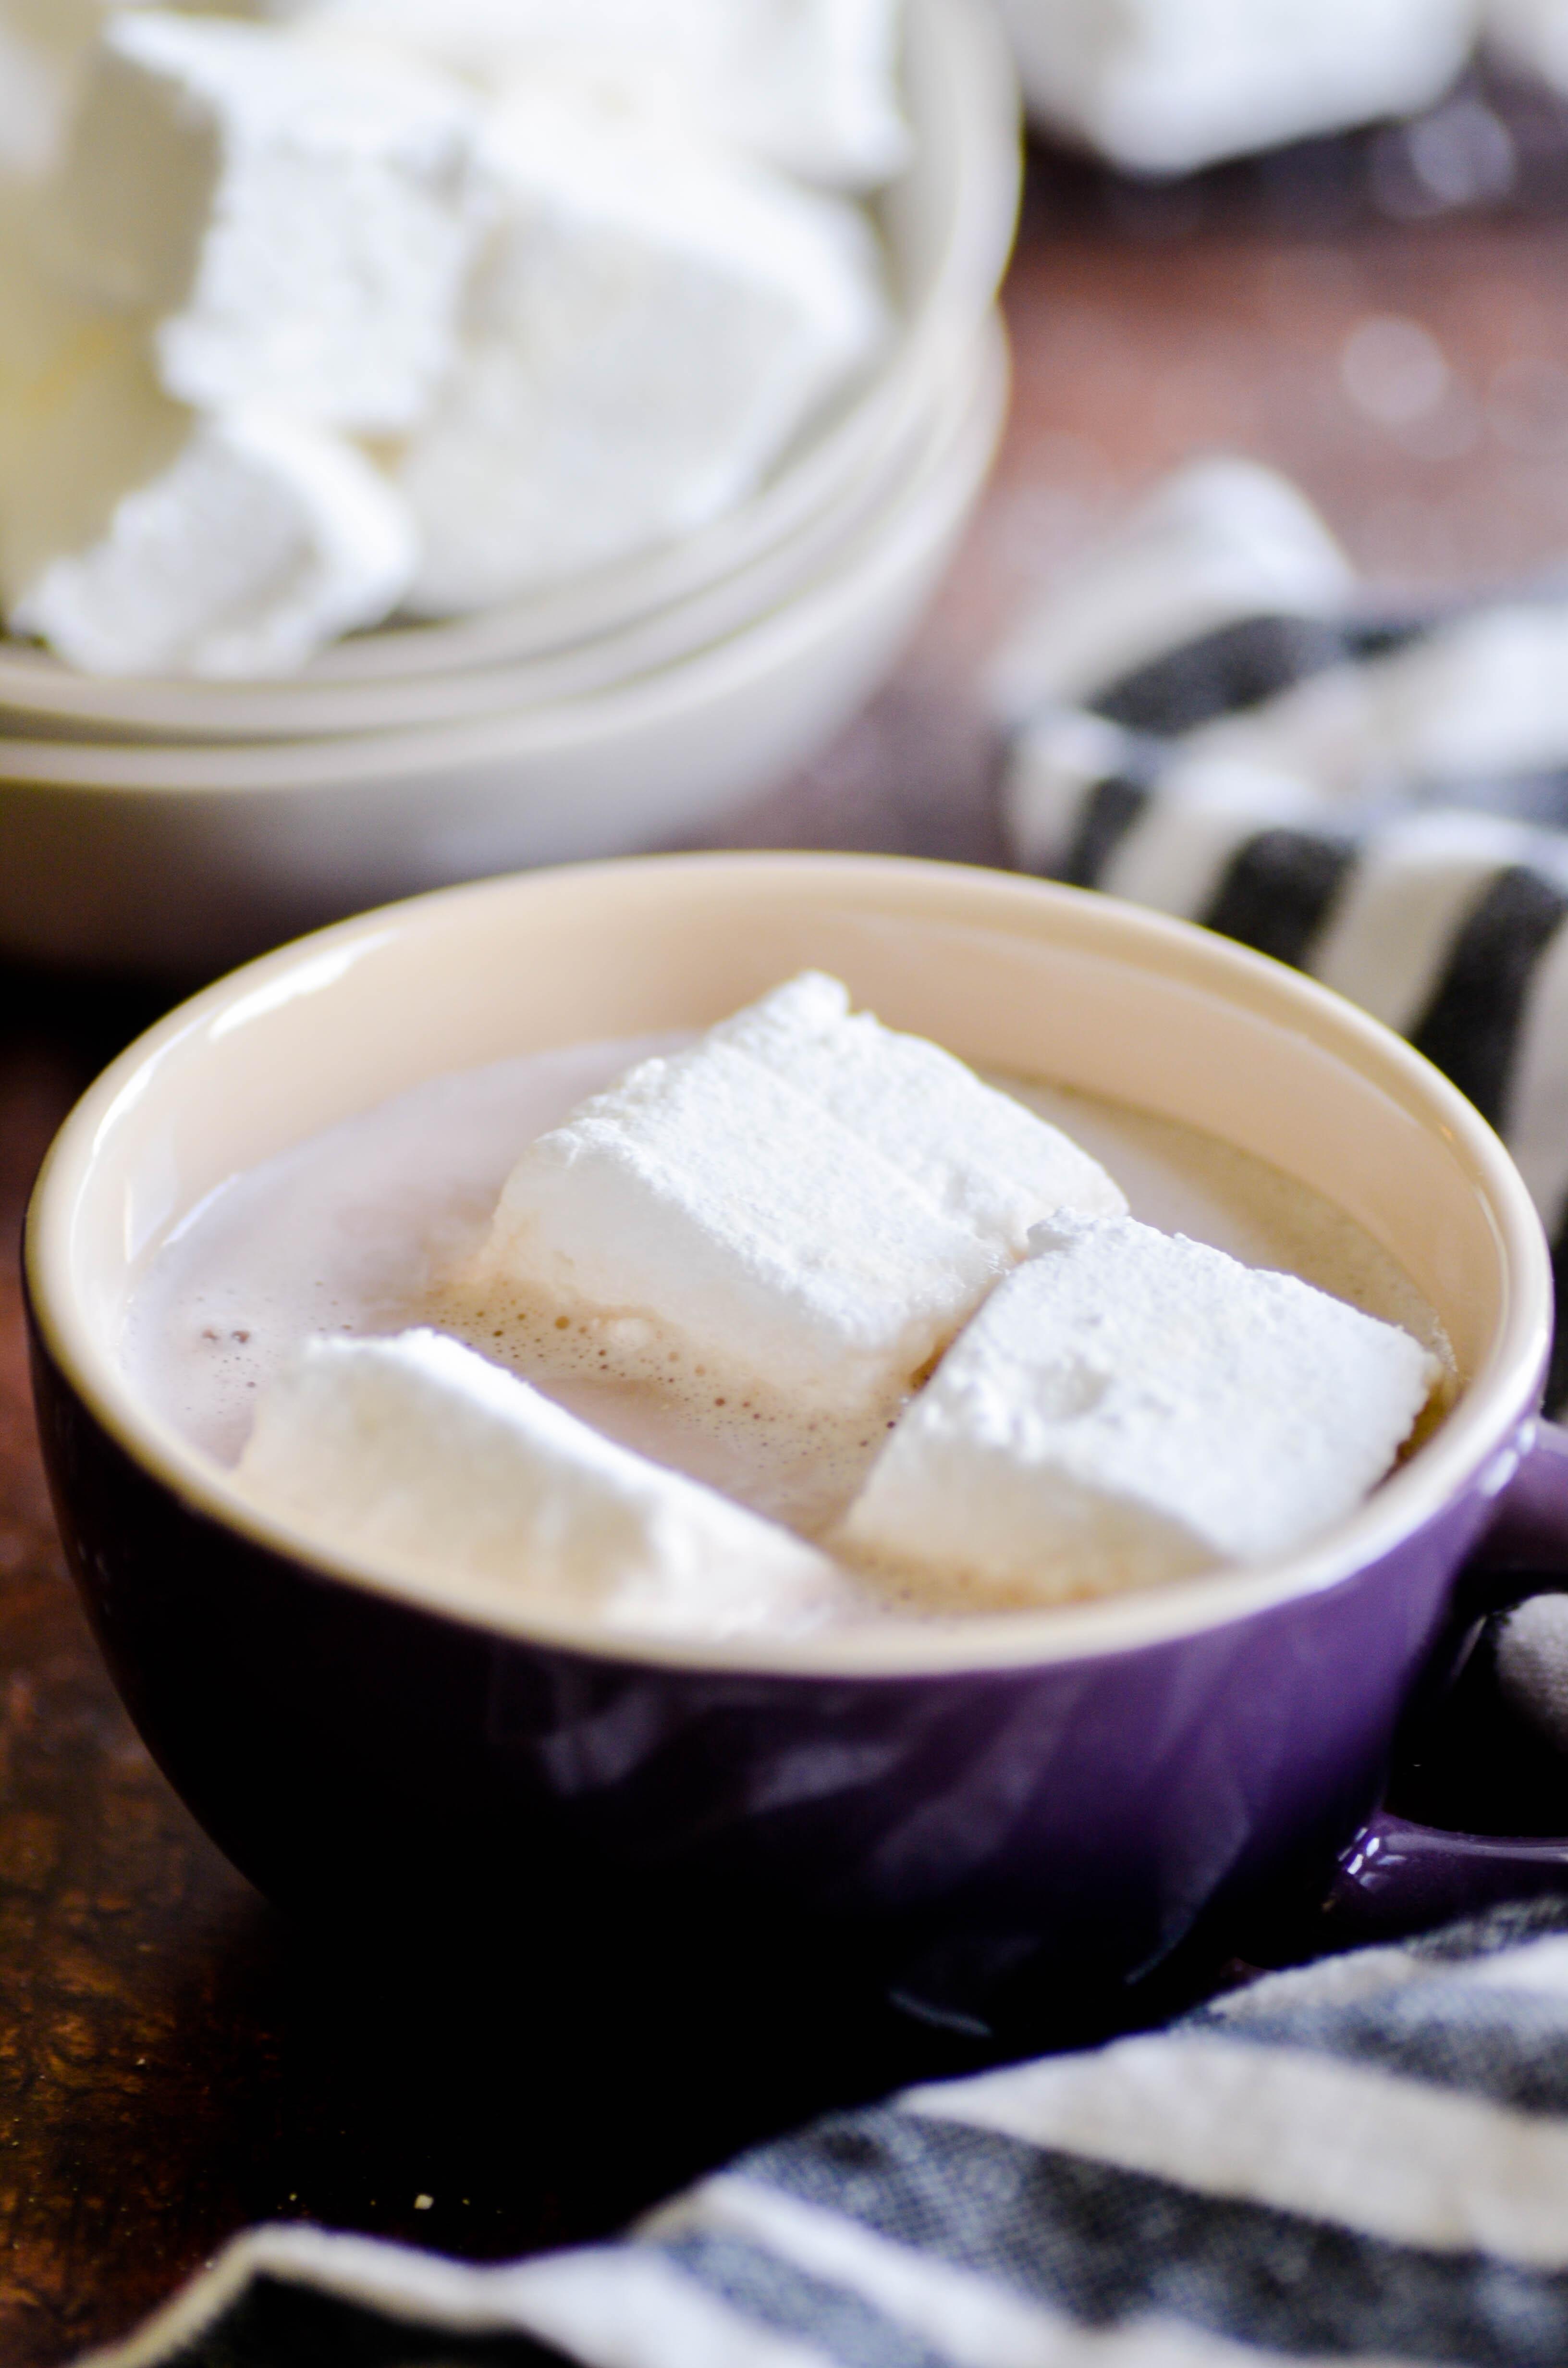 Ina Garten Marshmallows : garten, marshmallows, Homemade, Marshmallows, Recipe, Step-by-Step, Photos